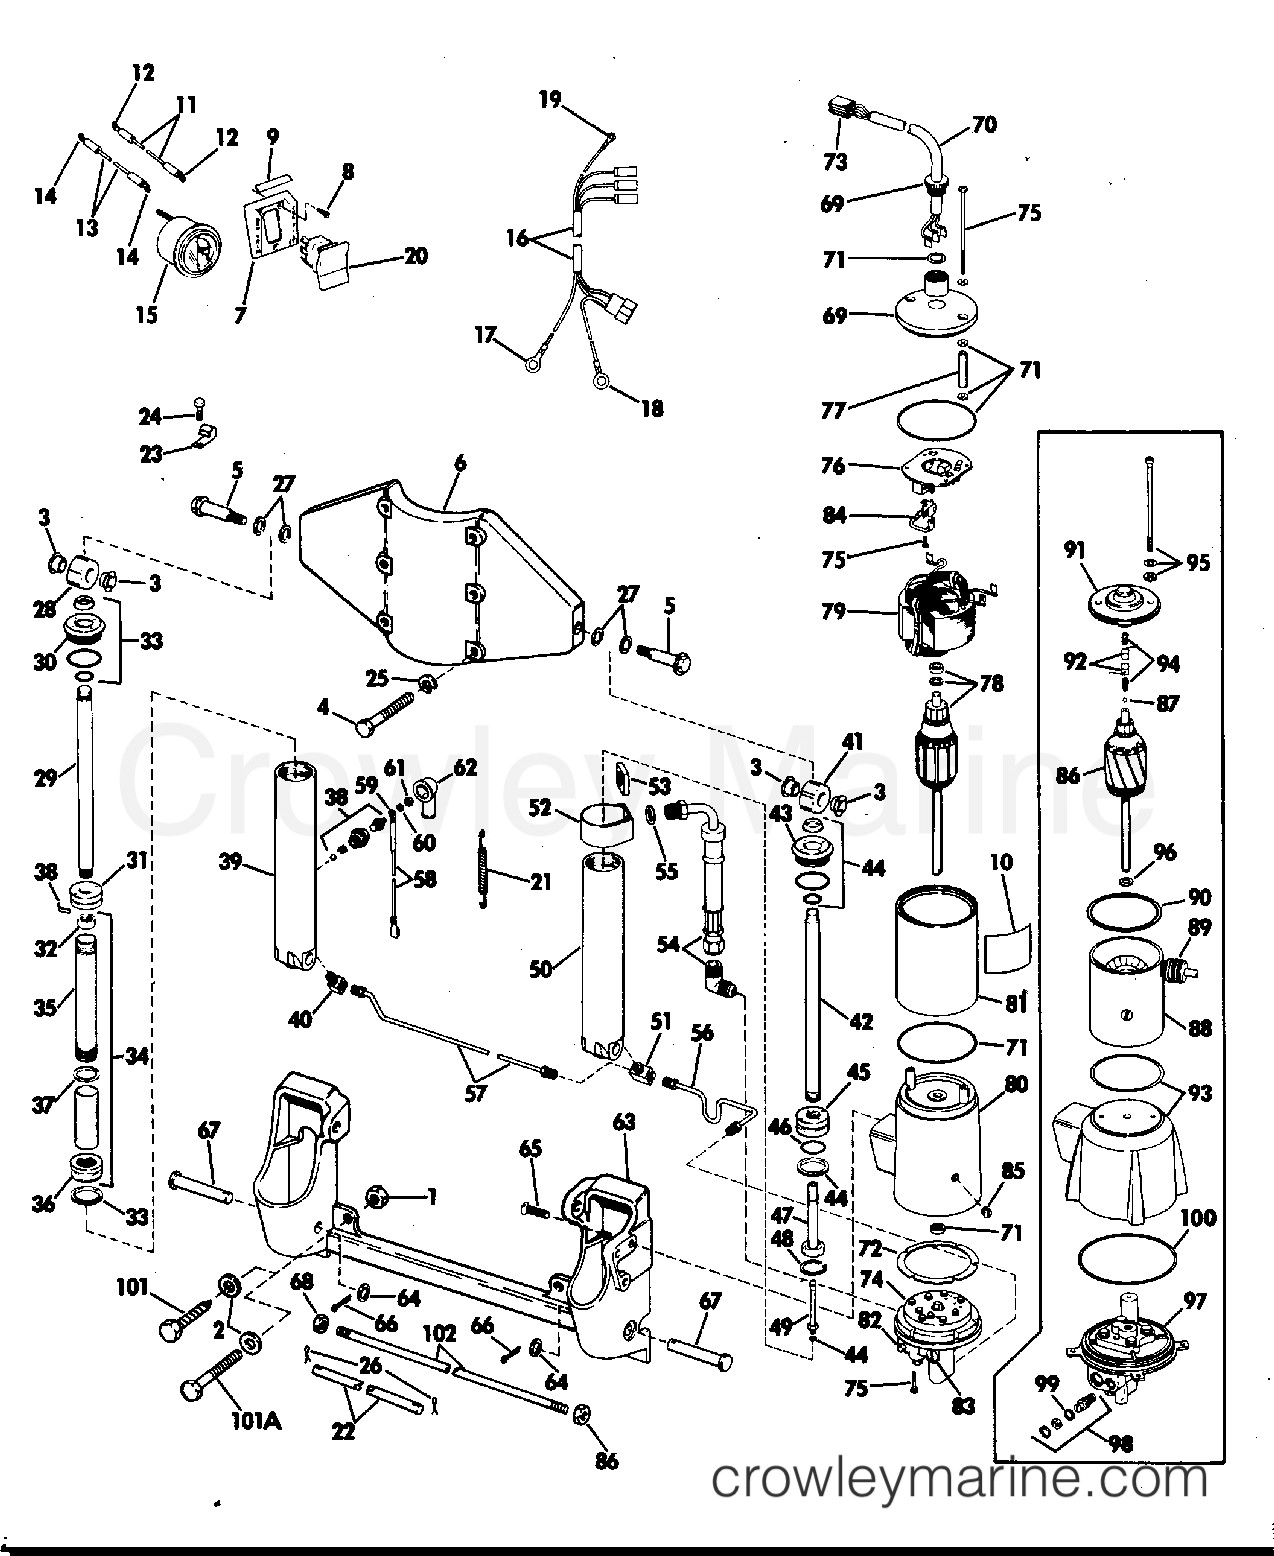 Evinrude 15 Hp Parts Diagram Power Tilt and Trim 55 Hp